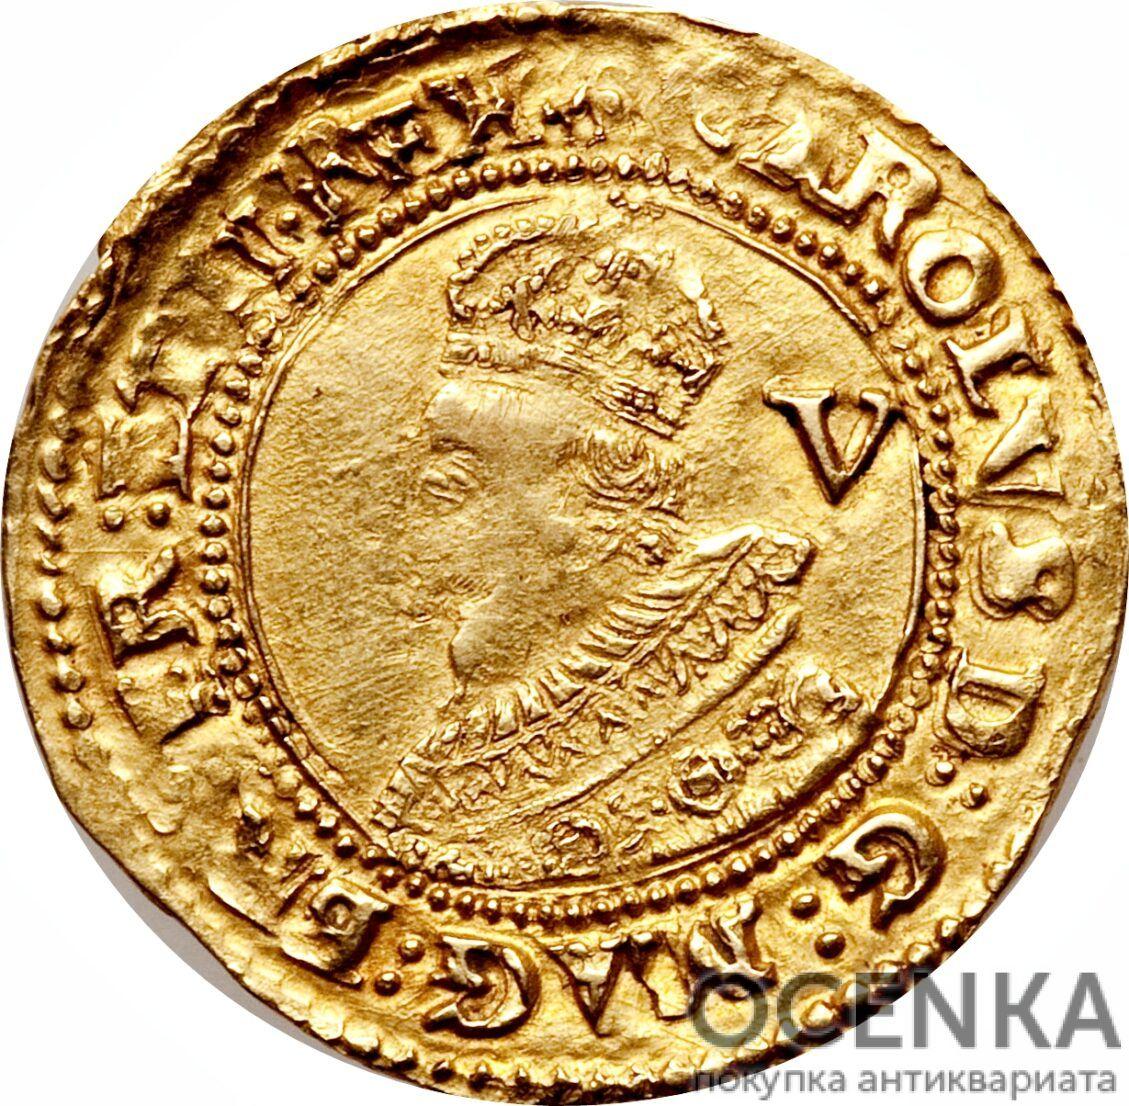 Золотая монета 1 Crown (крона) Великобритания - 8